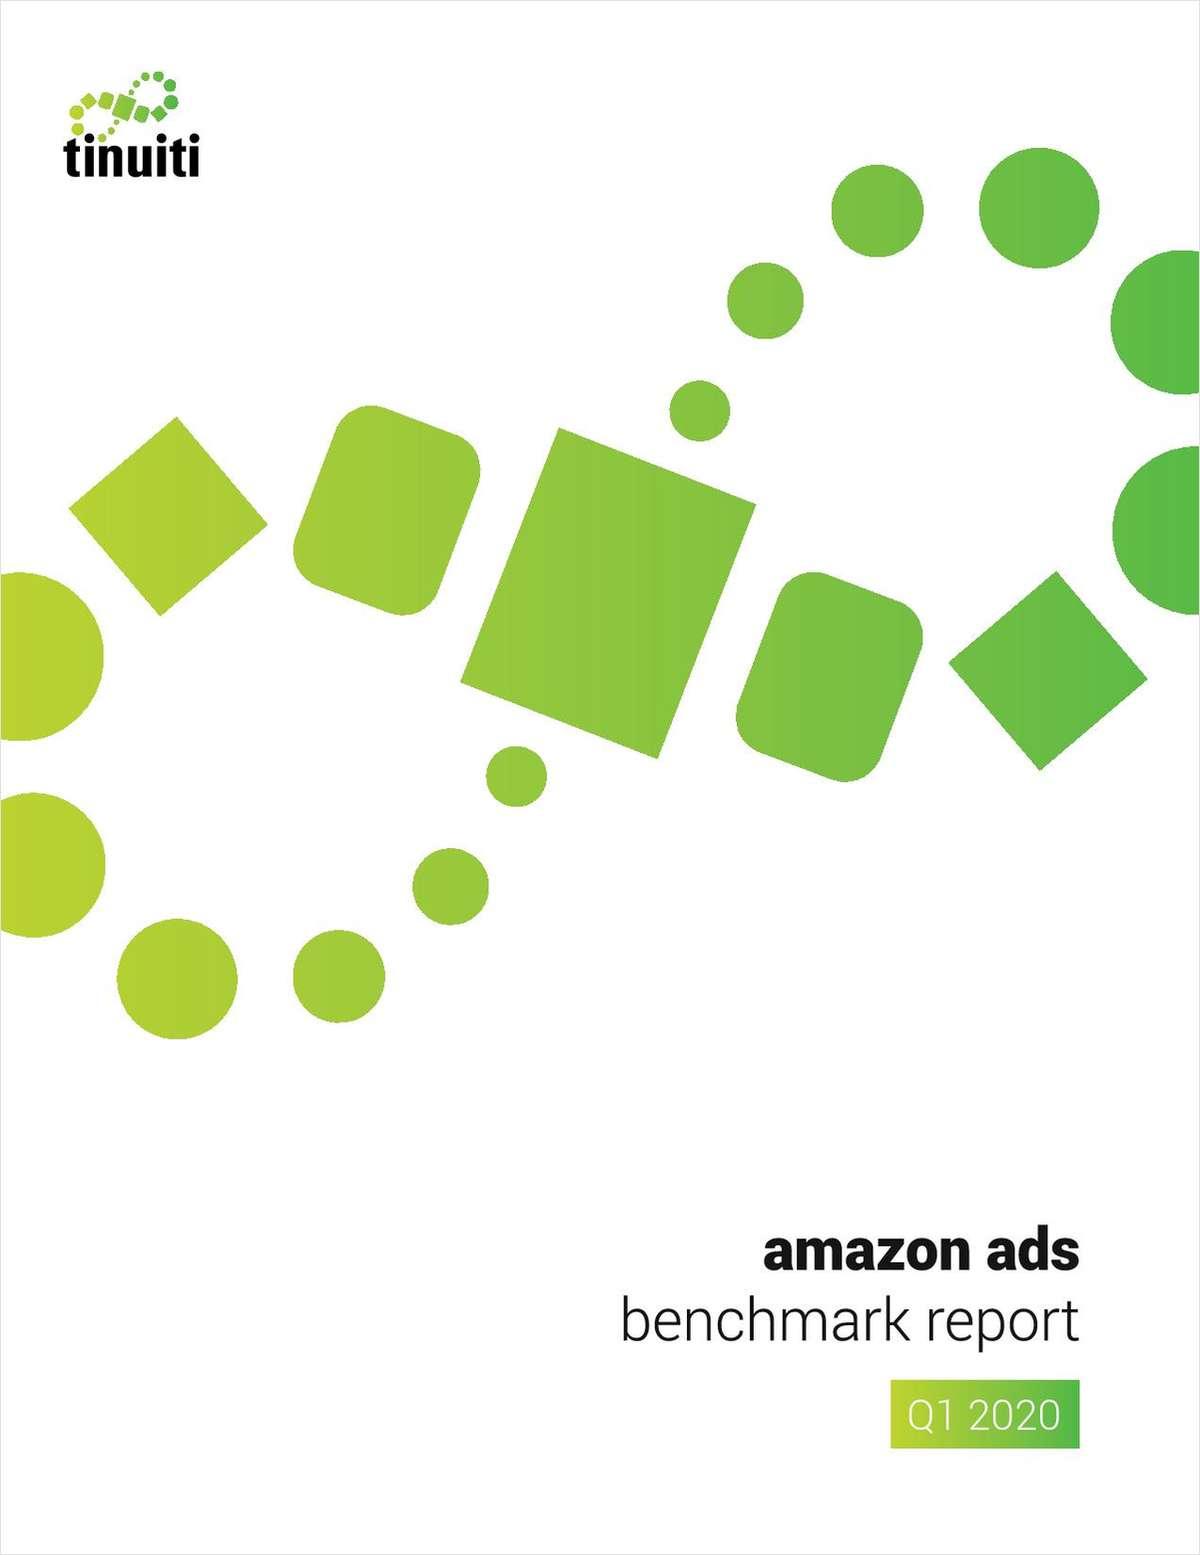 Amazon Ads Benchmark Report: Amazon Performance Data To Recalibrate Q2 & Beyond